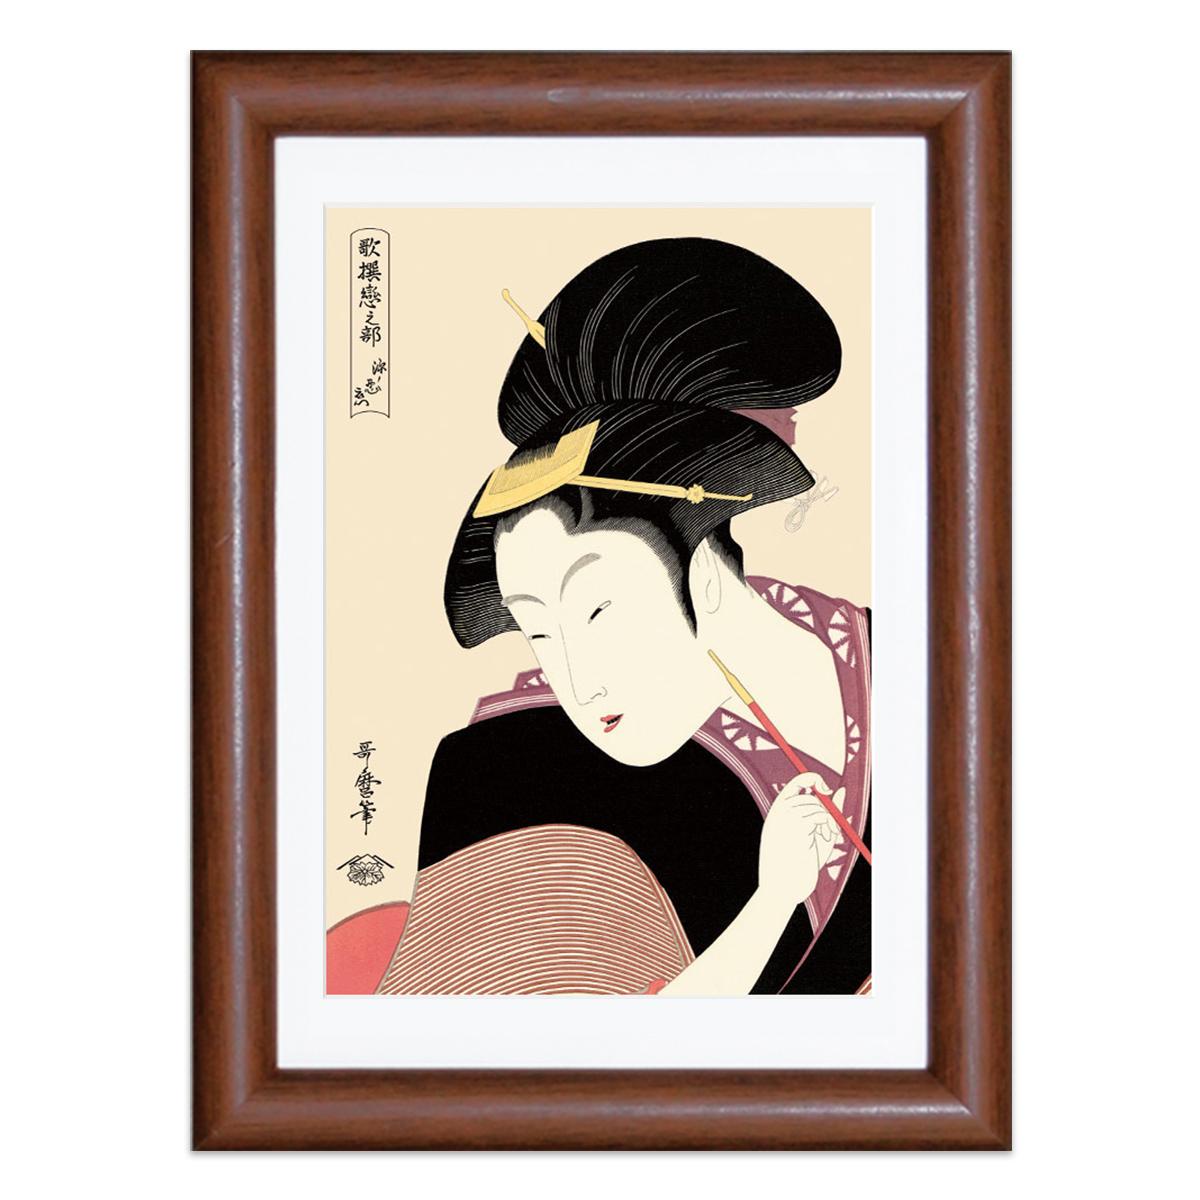 楽天市場 浮世絵 美人画 額飾り 深く忍恋 喜多川歌麿 サイズ 特小